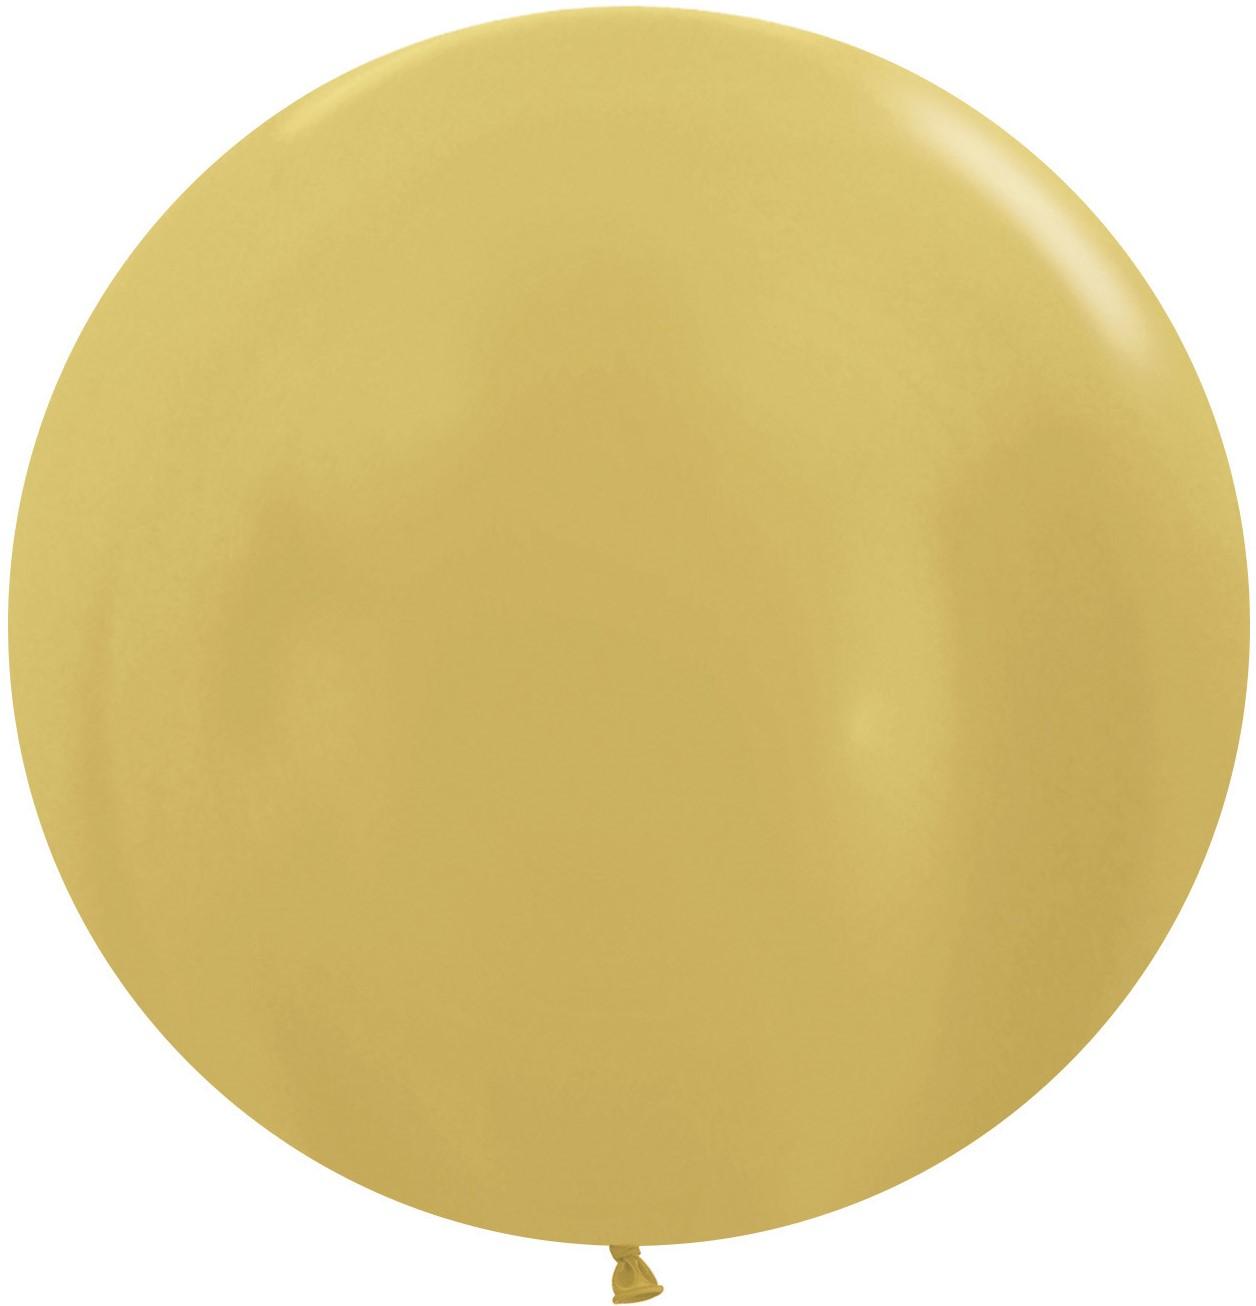 Большой шар гигант, золото (91 см)